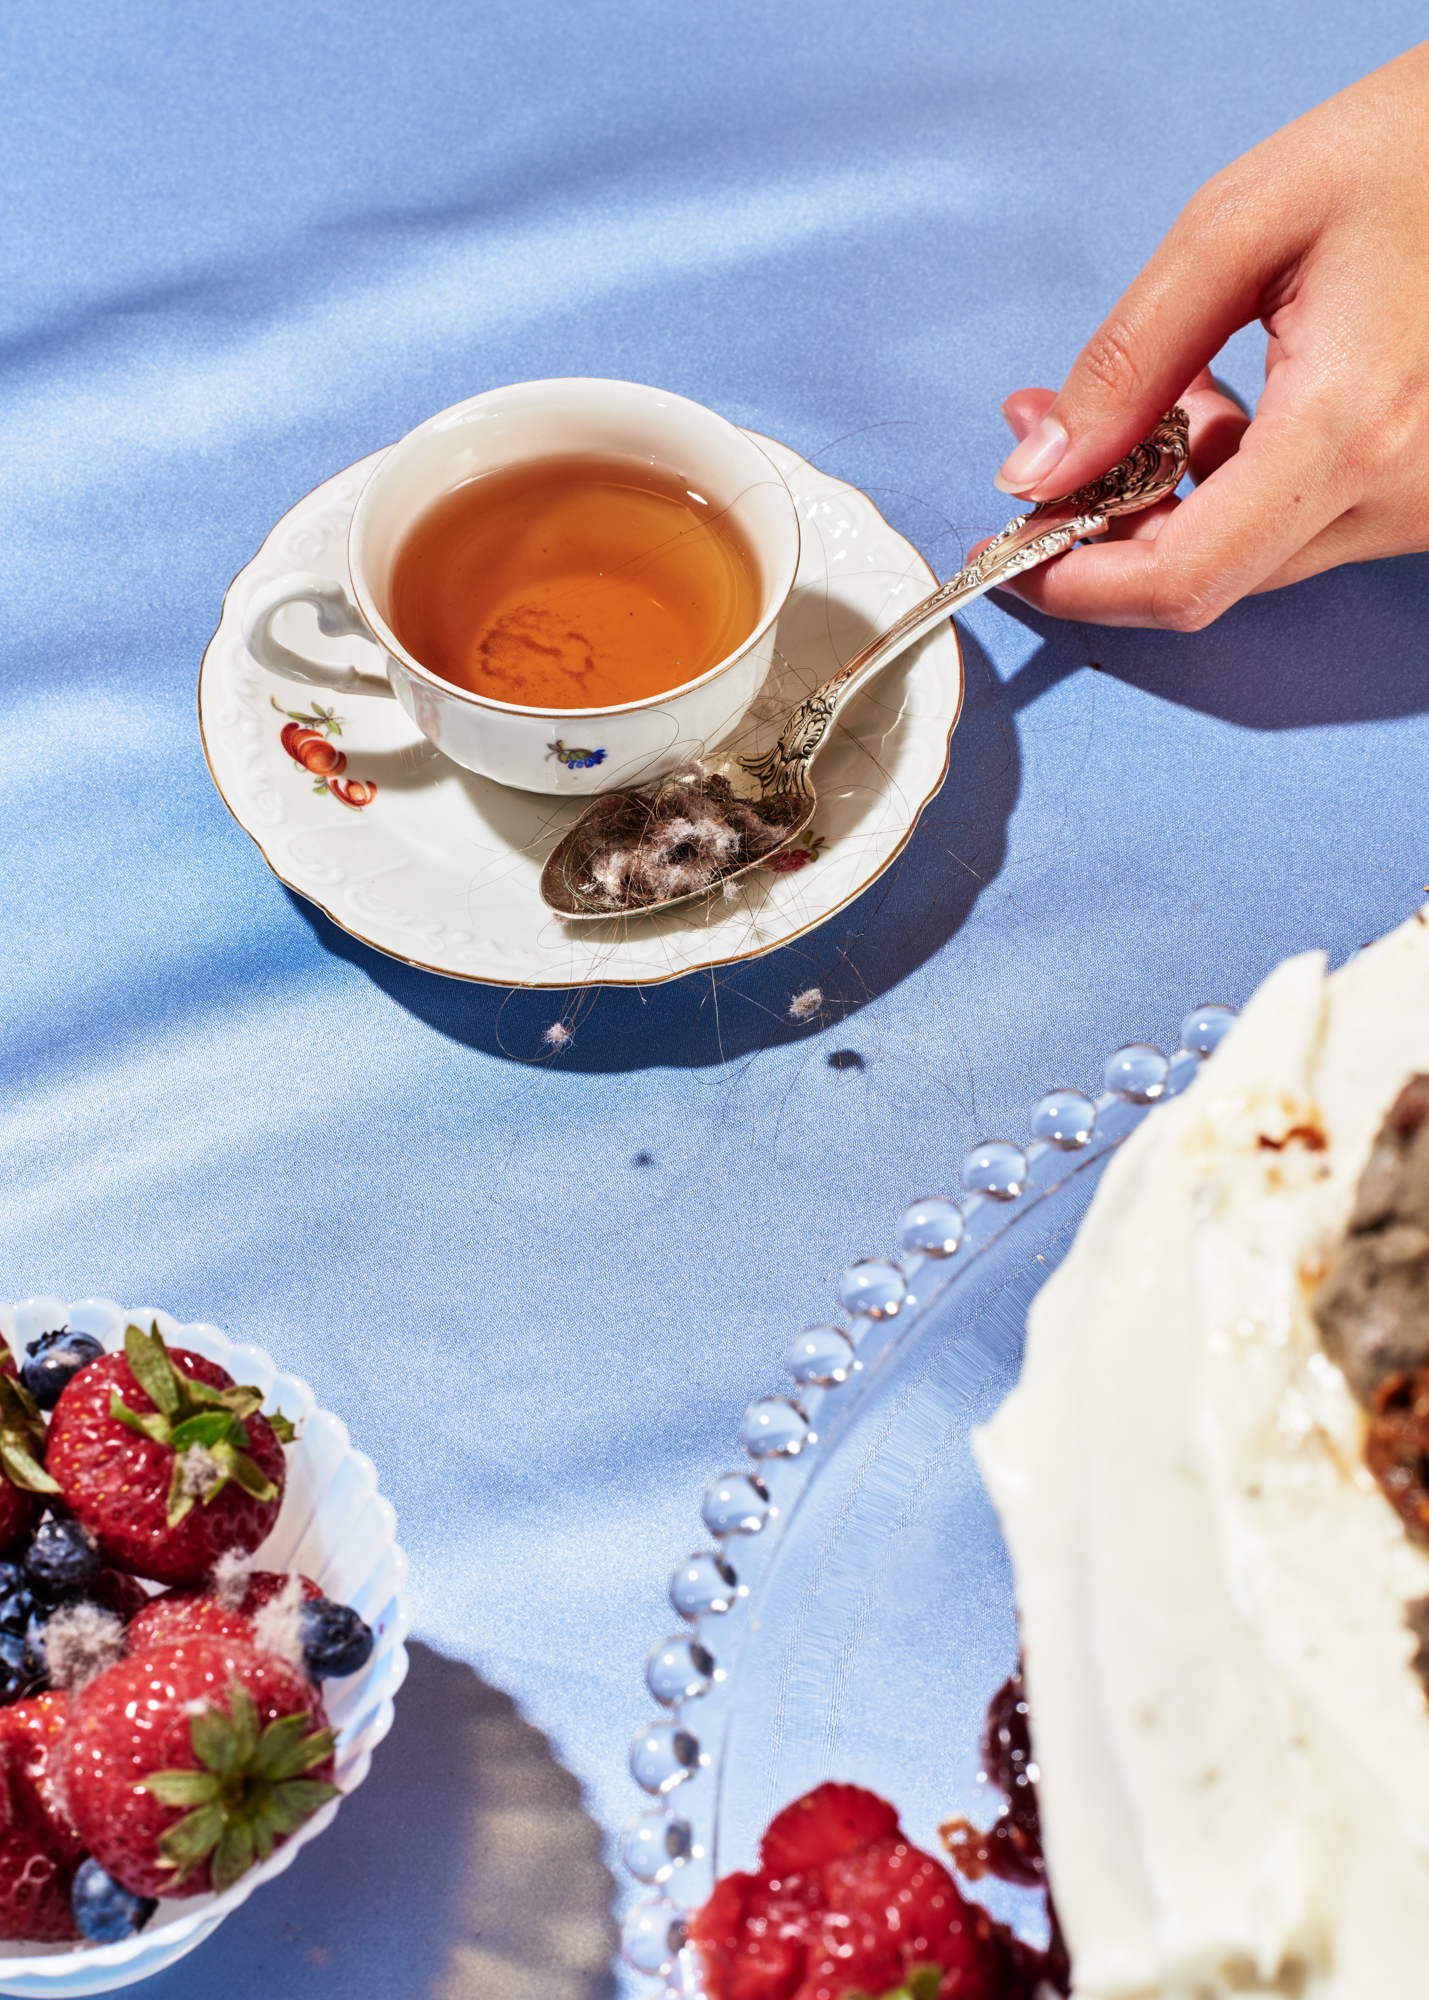 Spoiled-Rotten-Tea-Yasara-Gunawardena